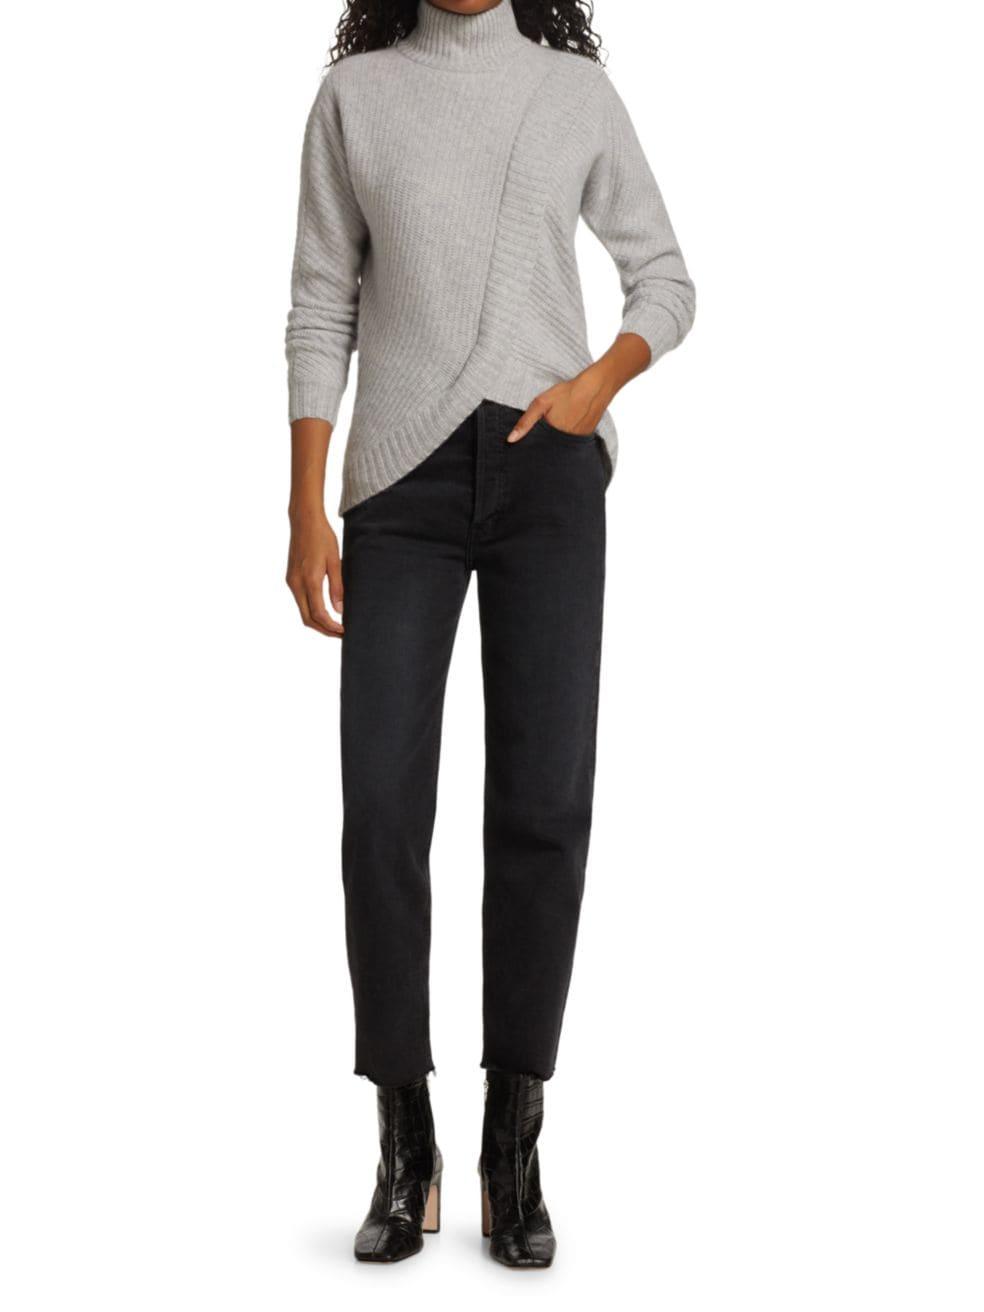 Saks Fifth Avenue COLLECTION Cashmere Turtleneck Sweater | SaksFifthAvenue